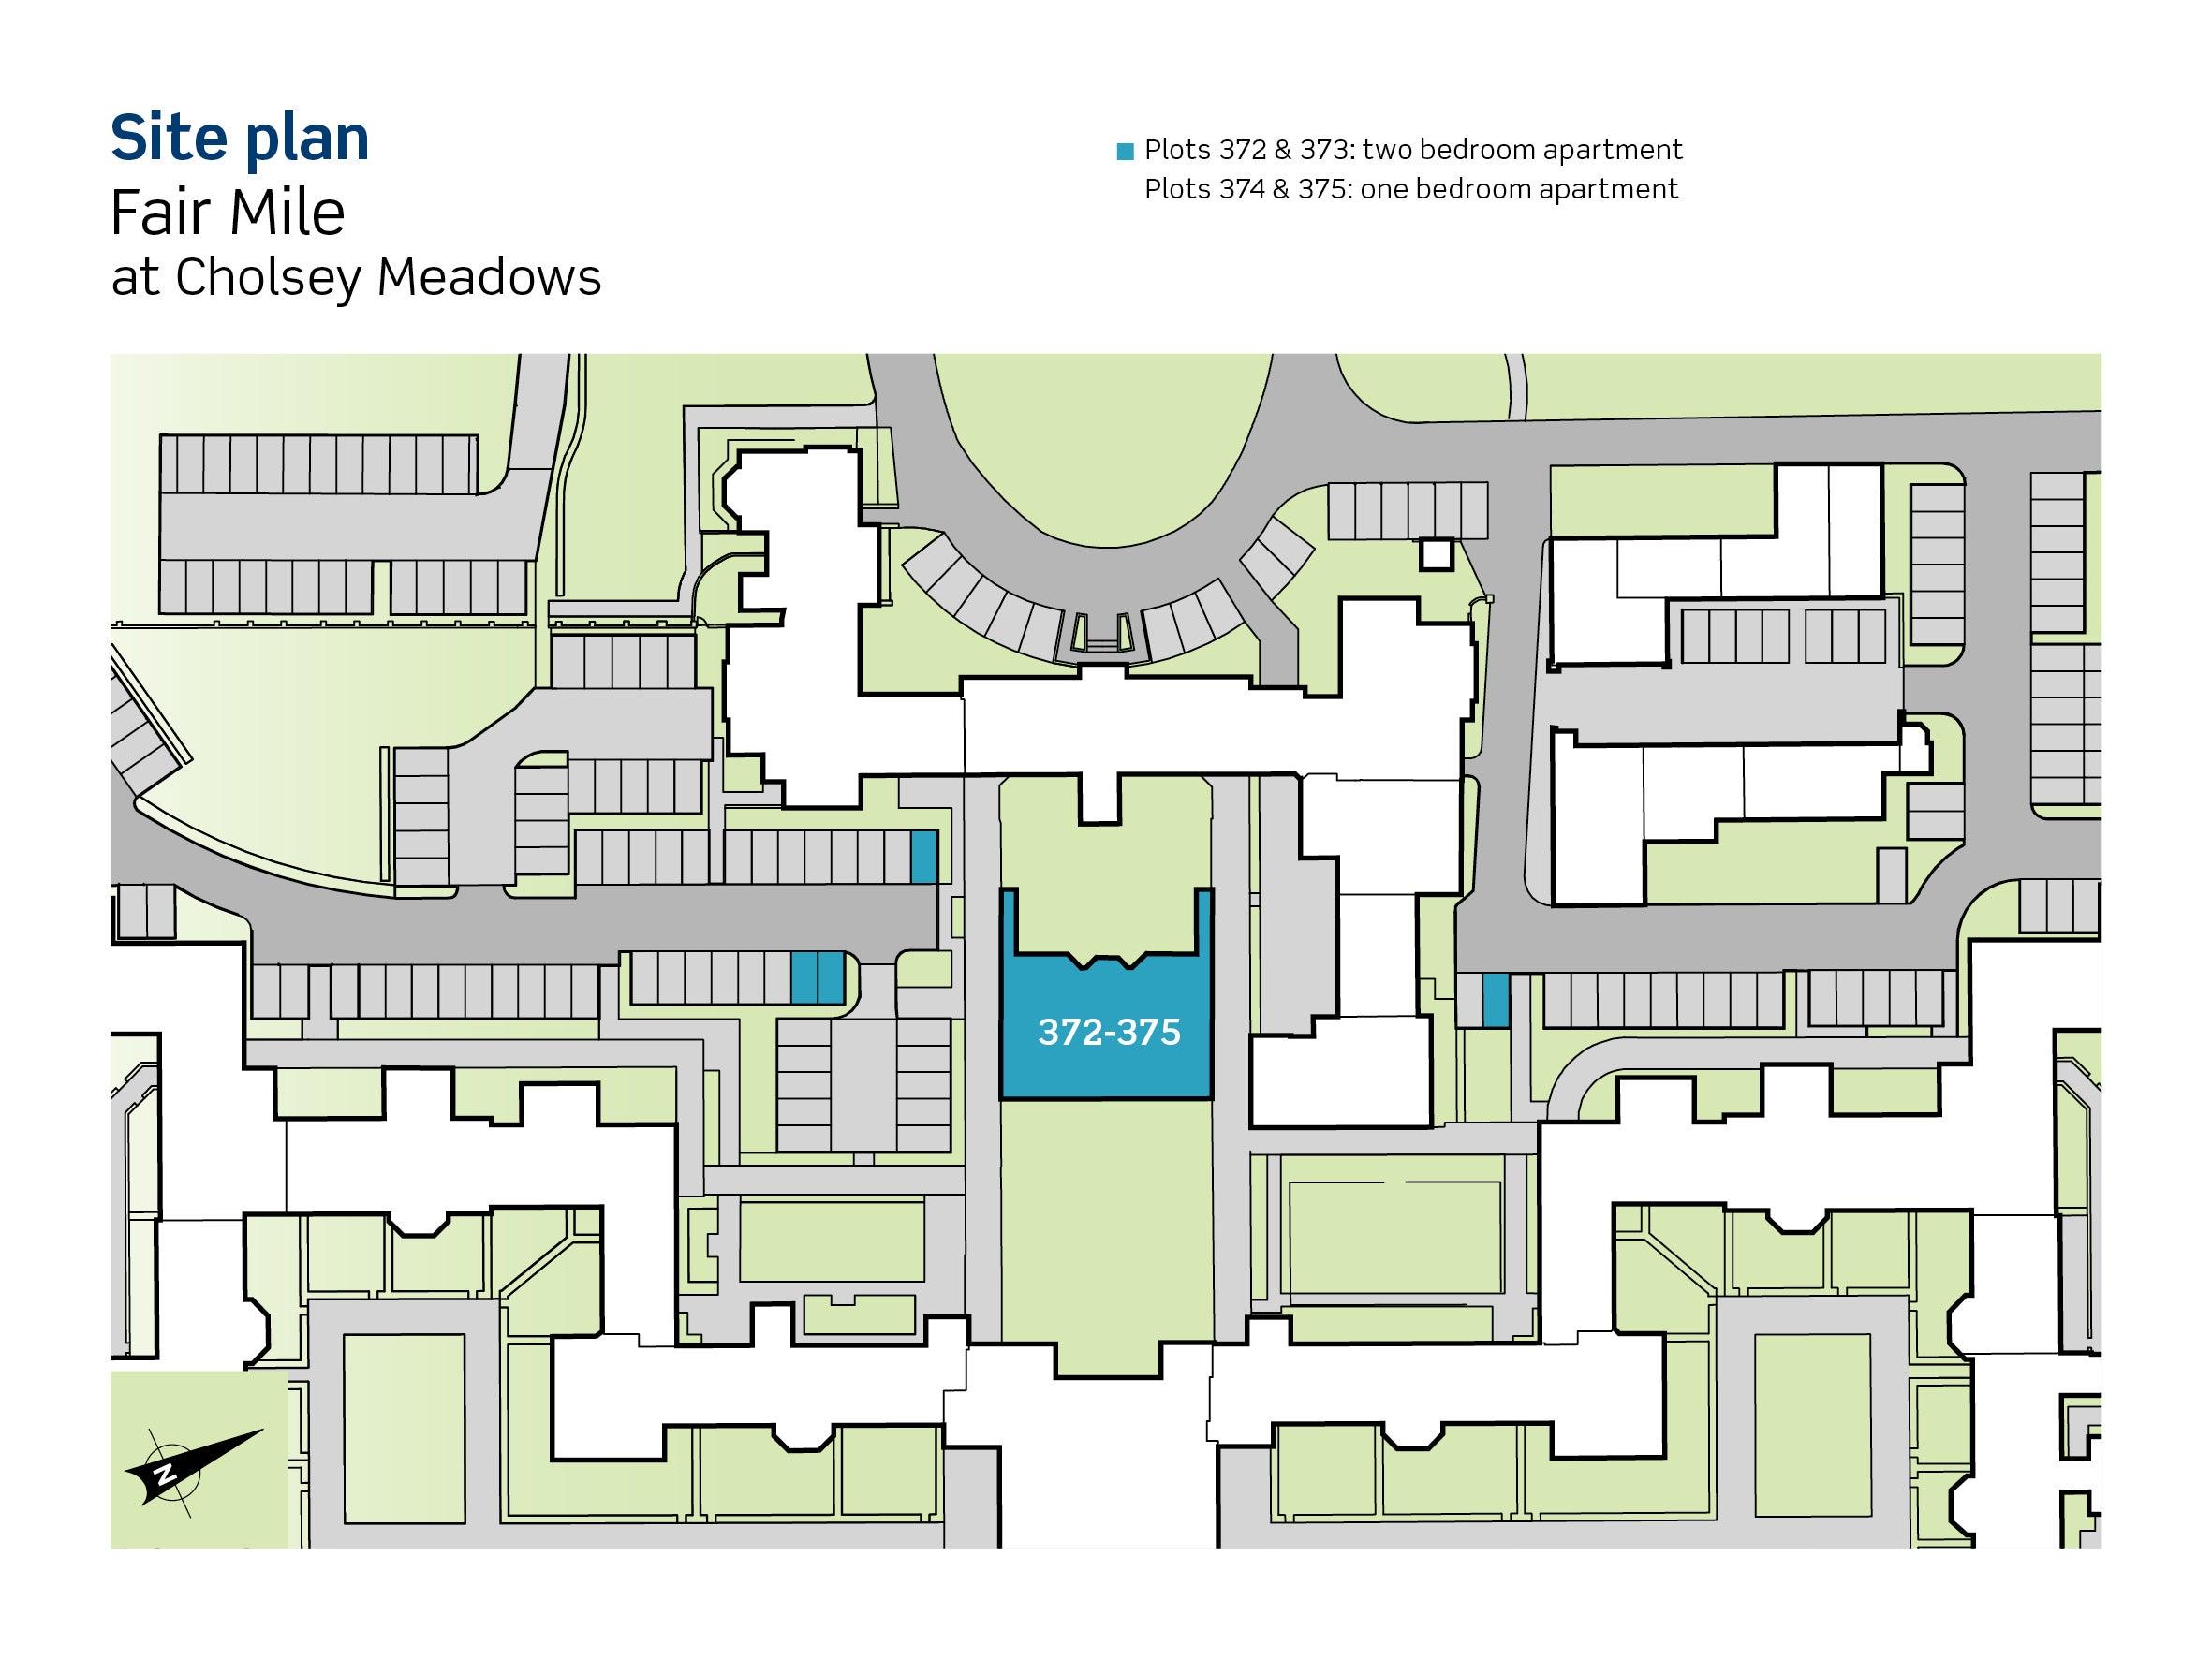 Fair Mile at Cholsey Meadows site plan